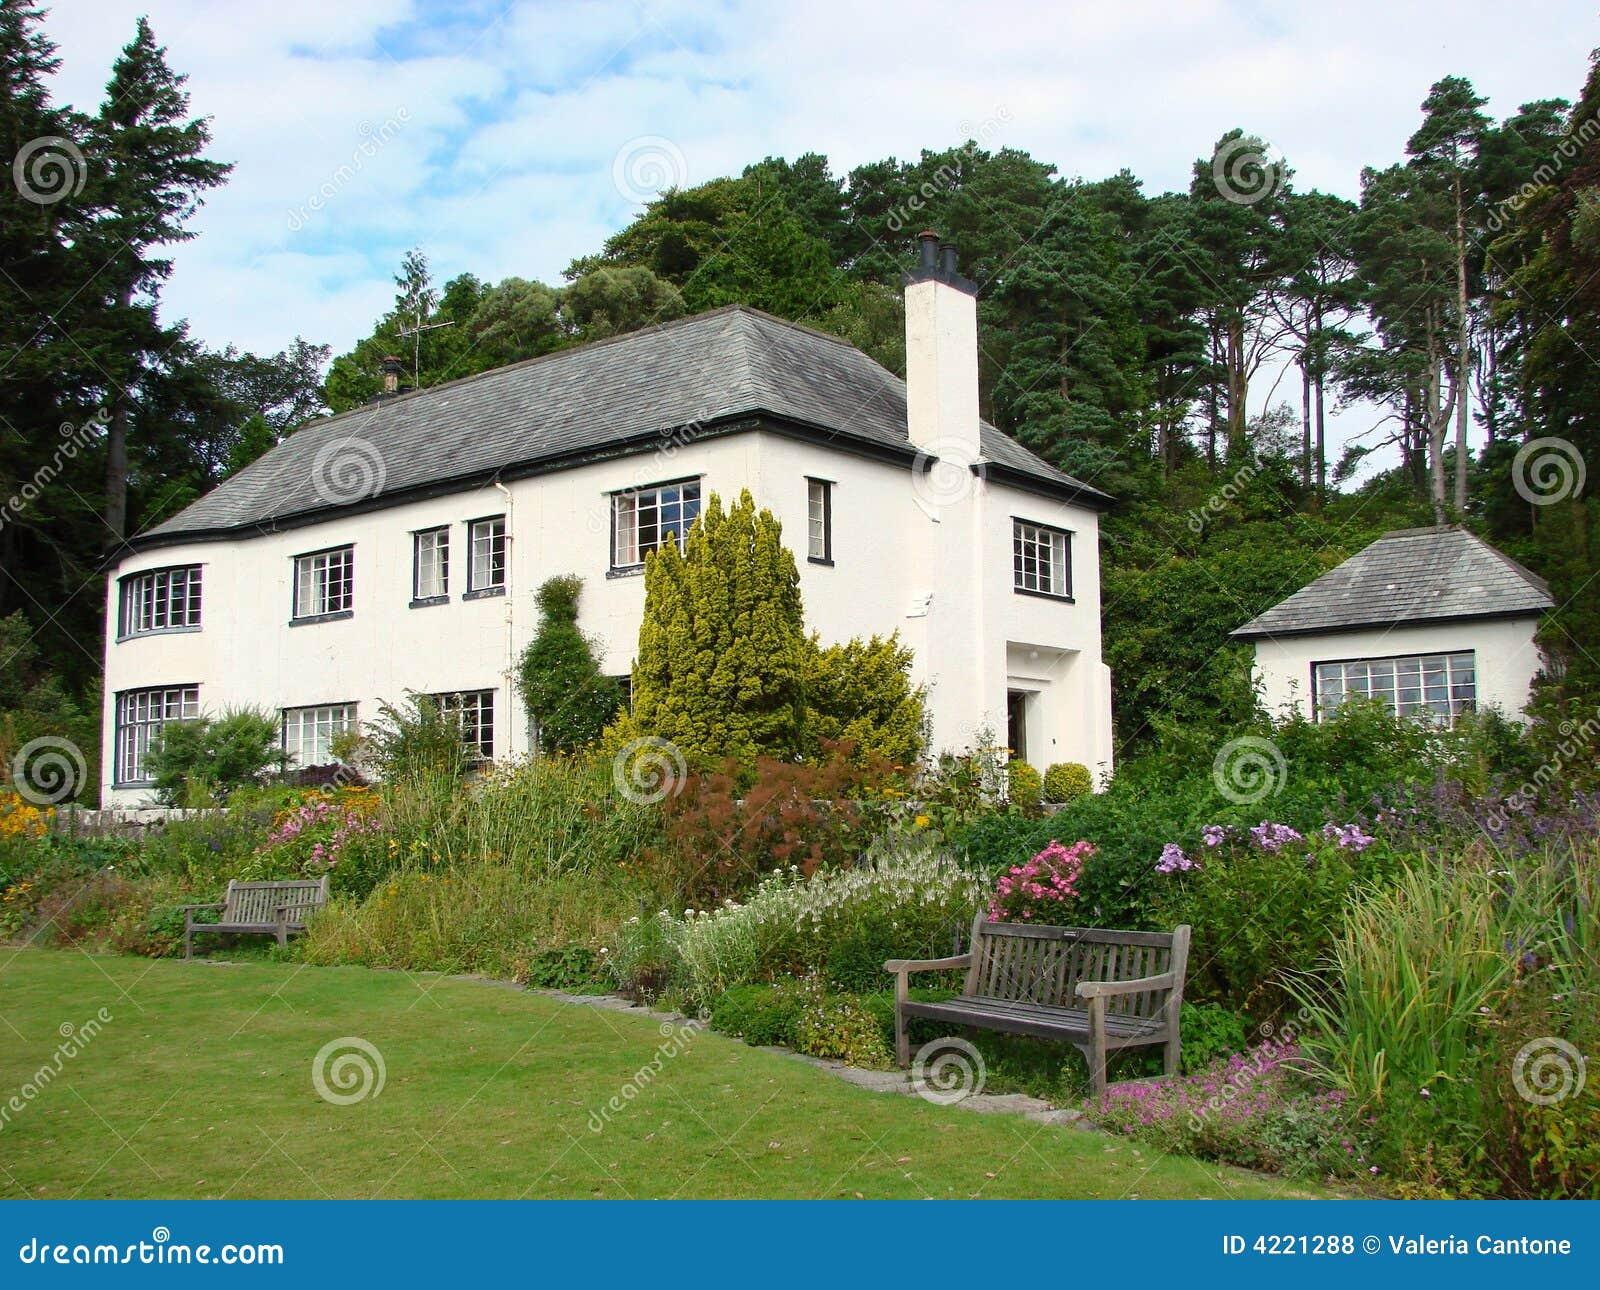 Inverewe House and Gardens, Scotland